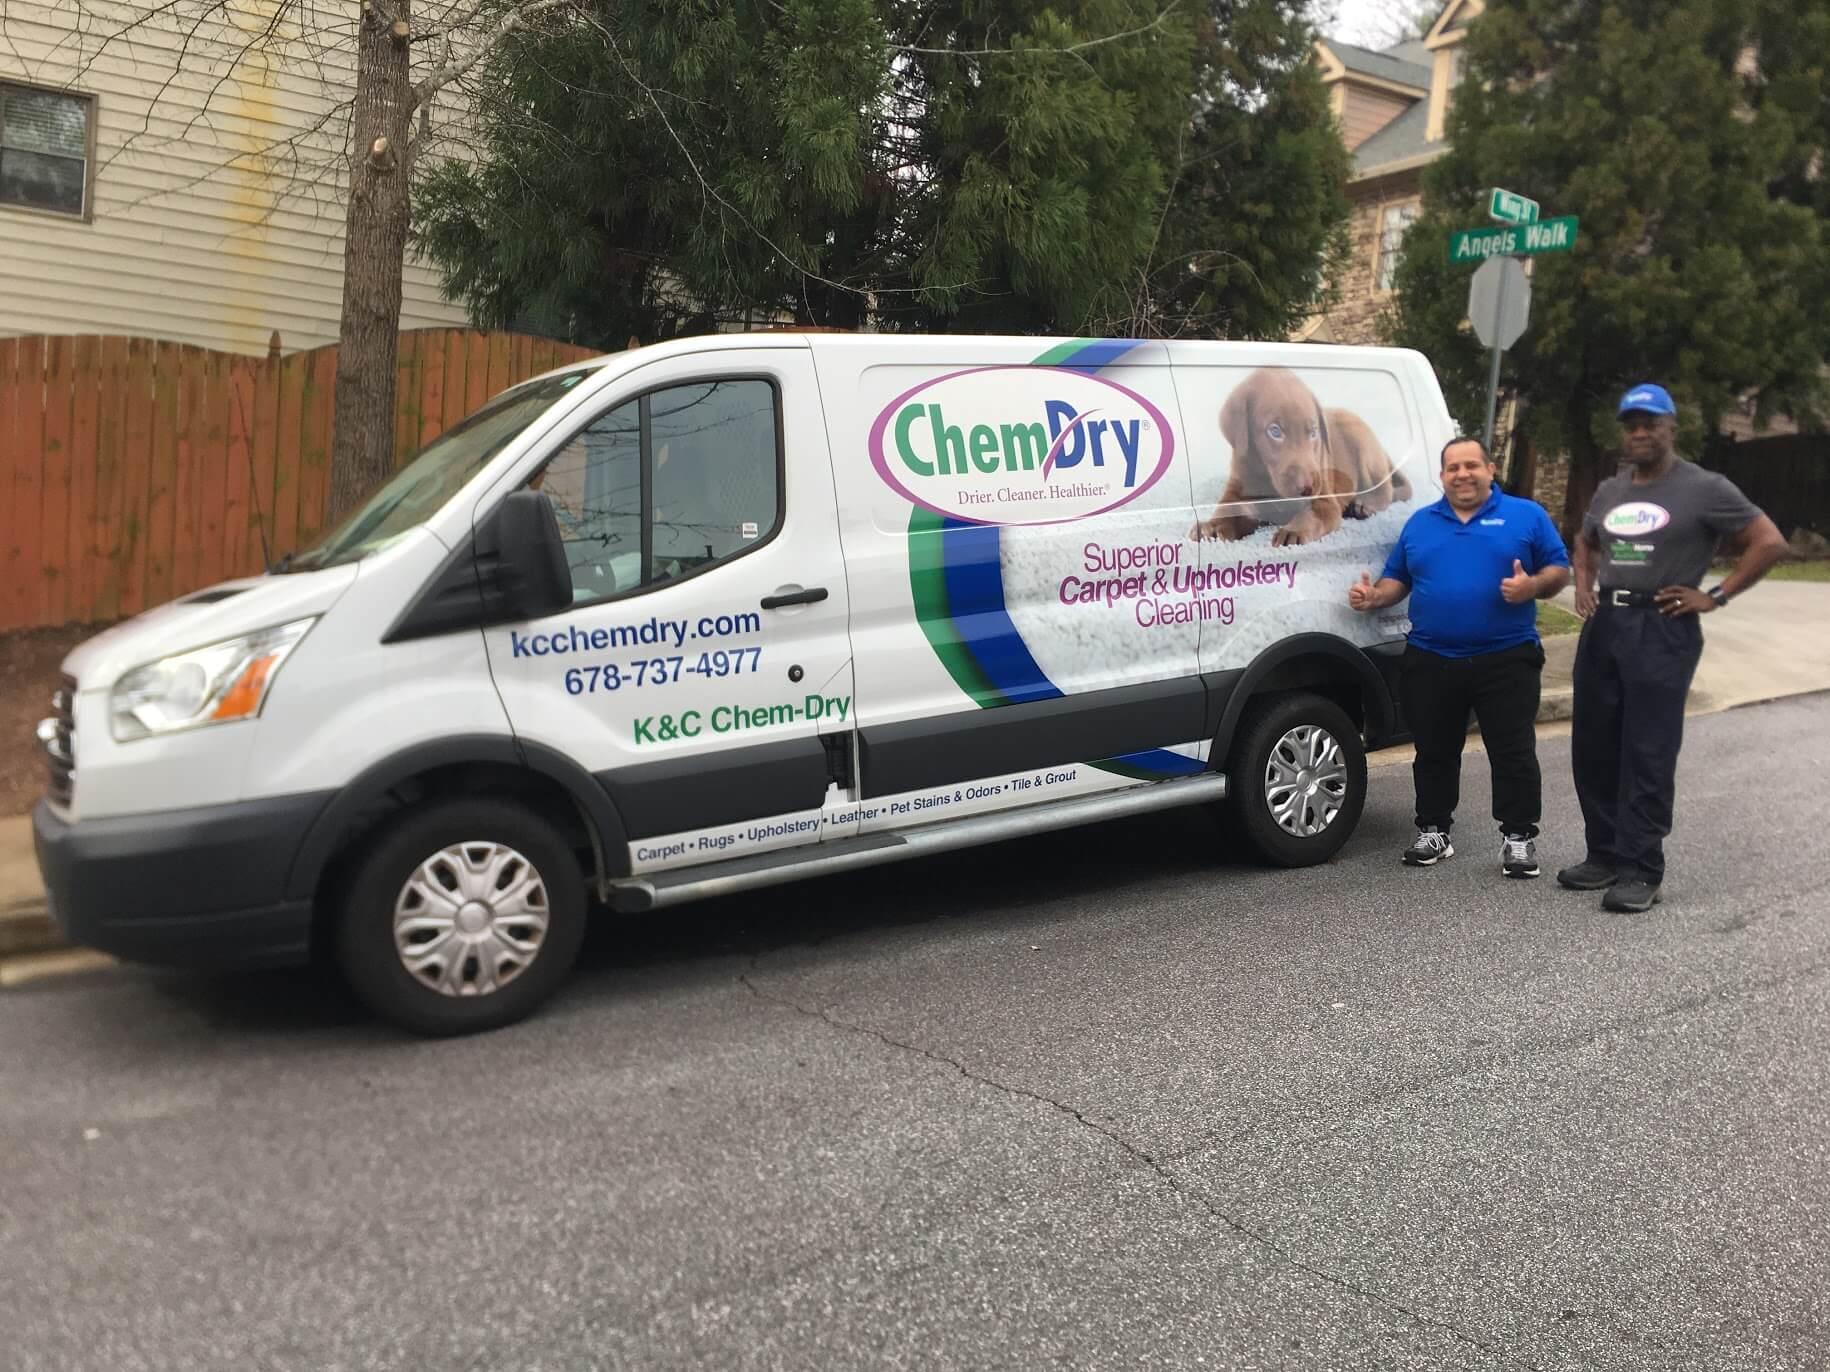 K&C Chem-Dry technicians in front of white van